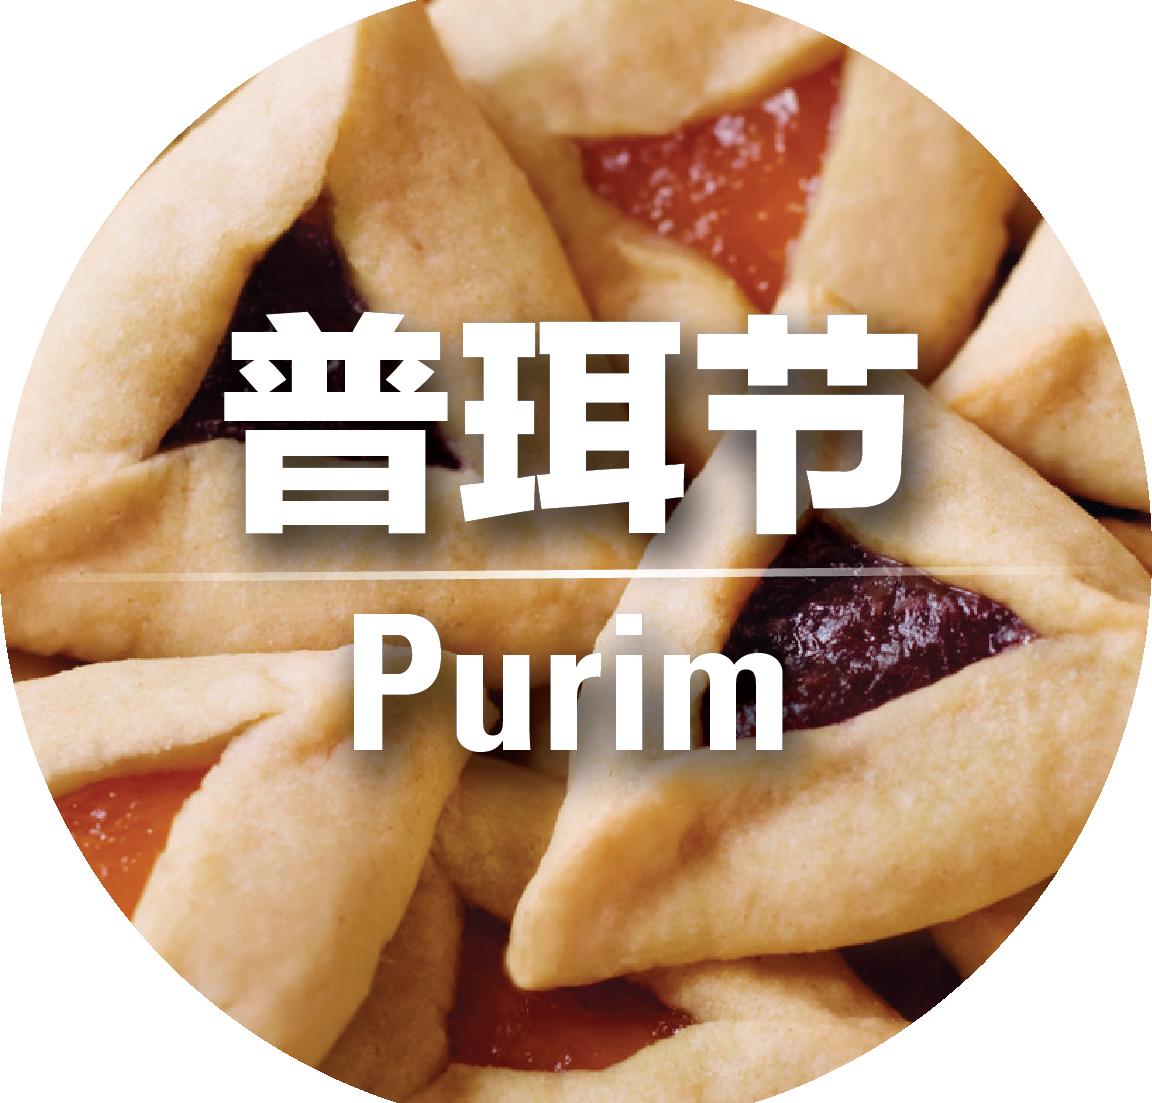 purim button